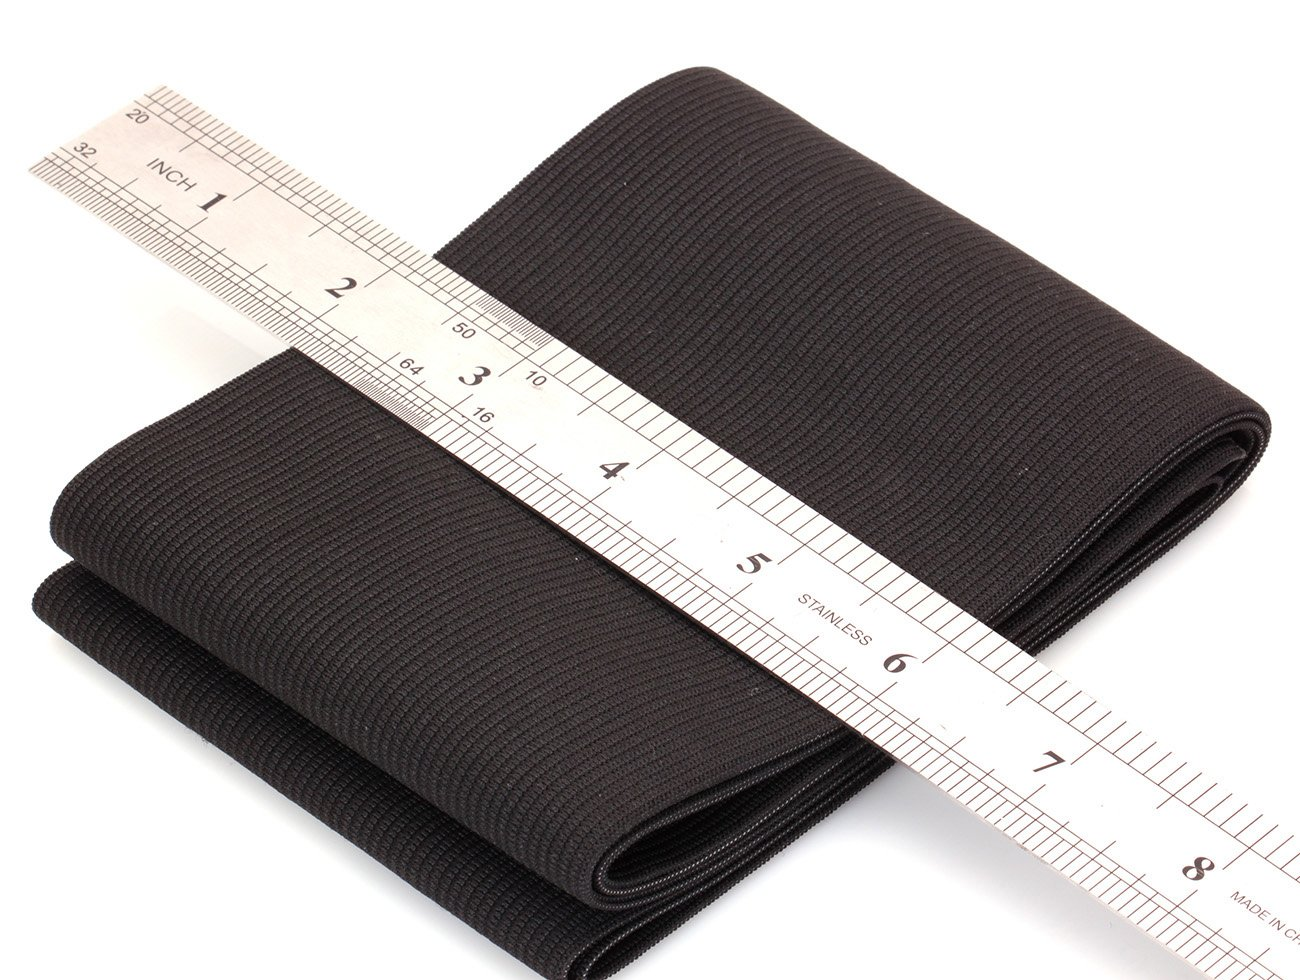 COTOWIN 4-inch Wide Black Knit Heavy Stretch High Elasticity Elastic Band 3 Feet 4337000444